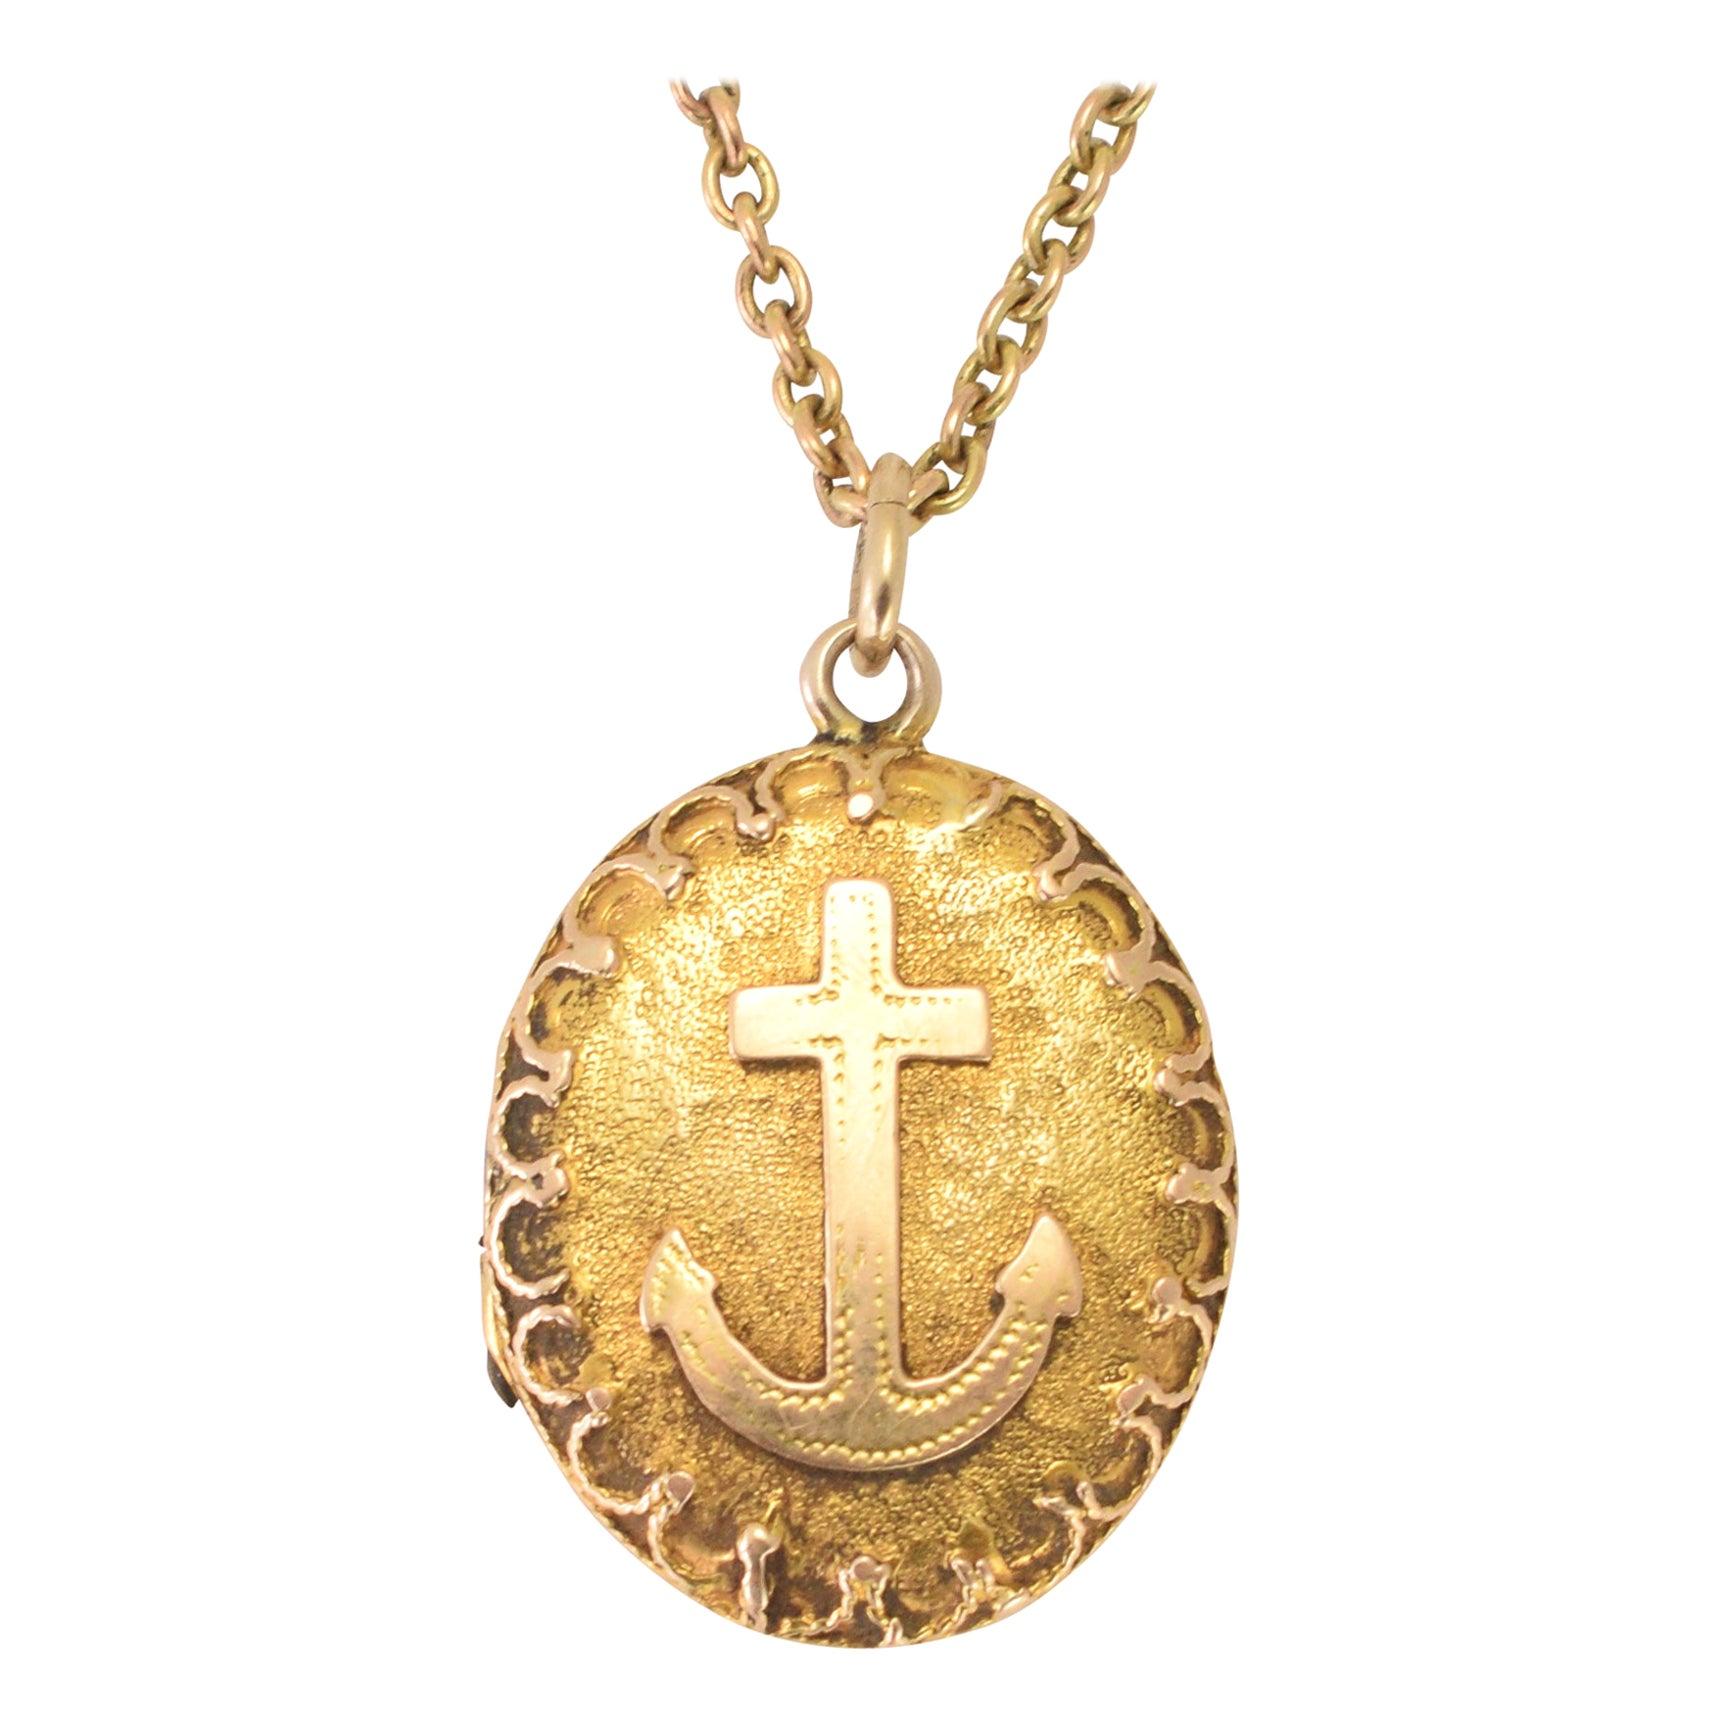 Antique Victorian Gold Anchor Locket